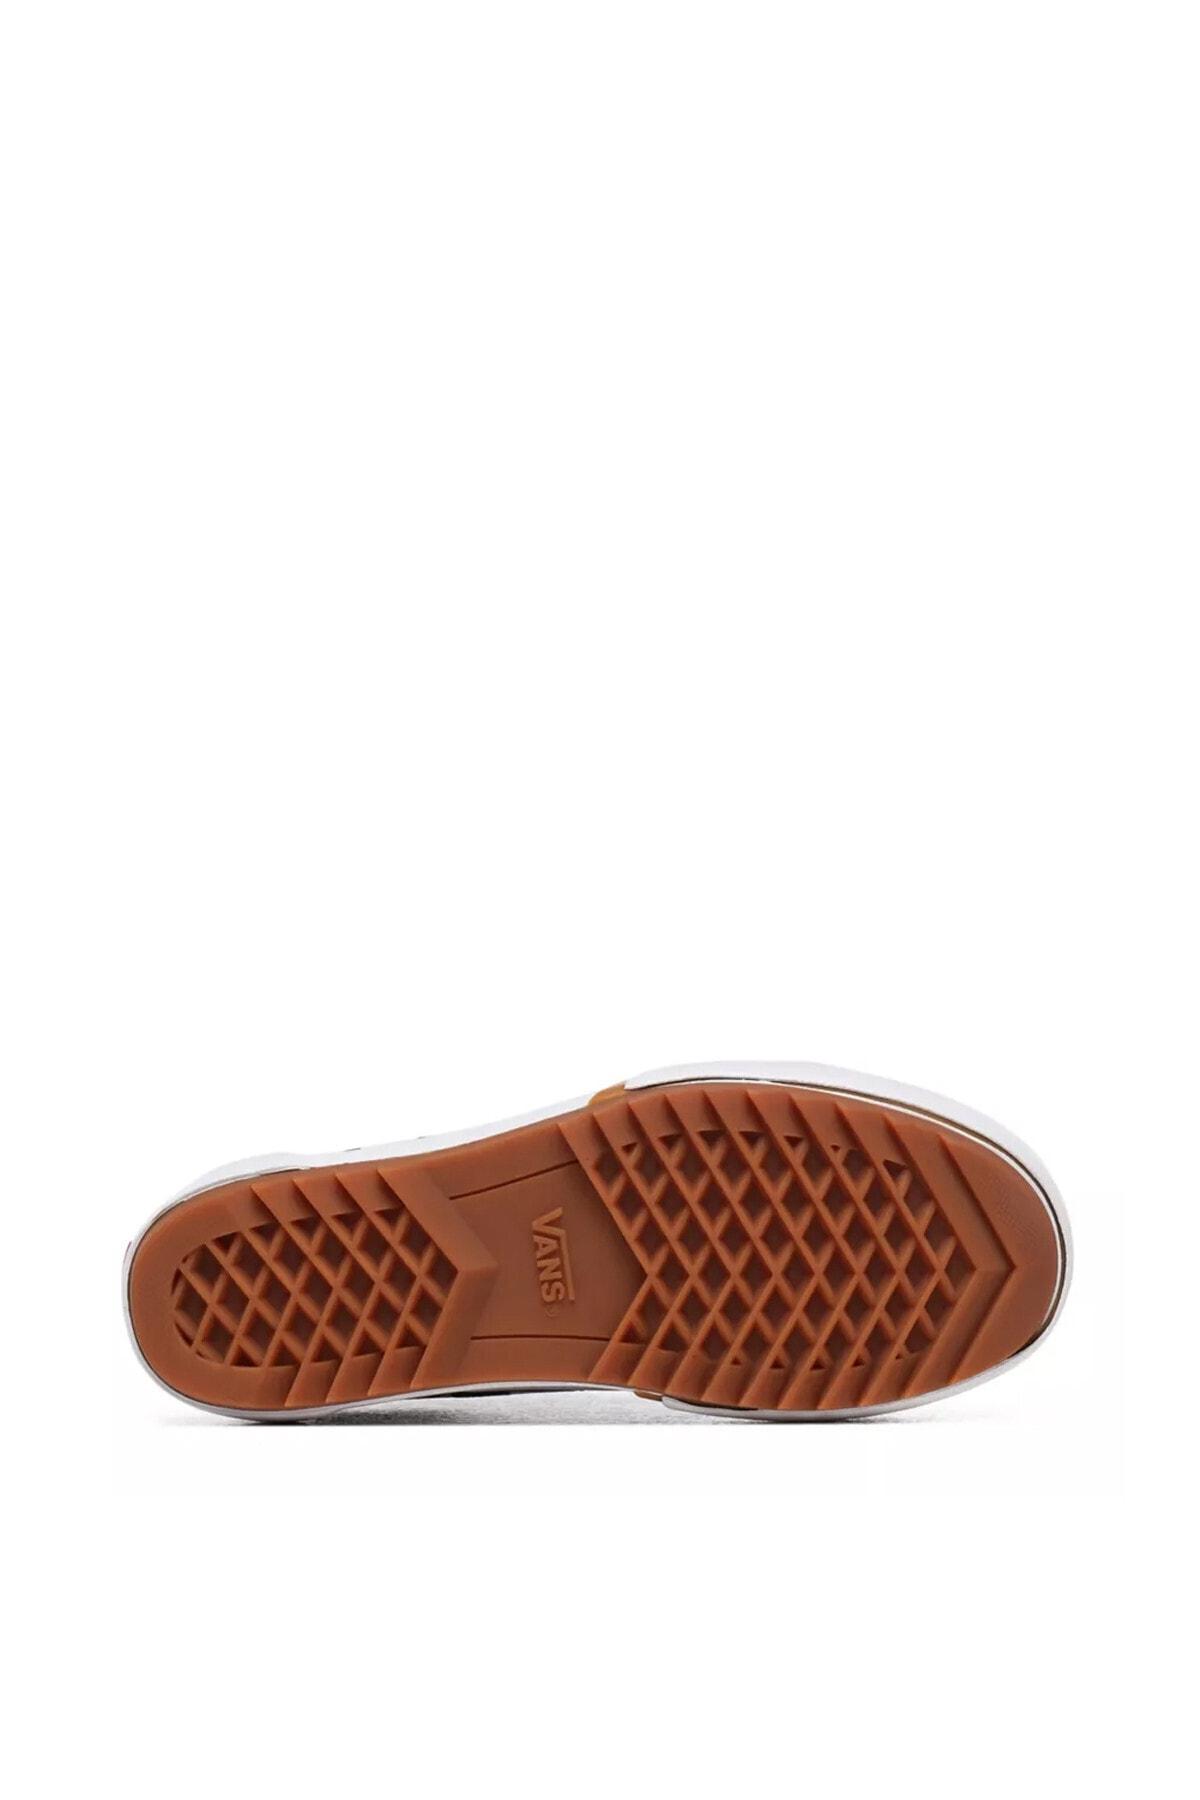 Vans Checkerboard Old Skool Stacked Kadın Ayakkabısı Vn0a4u15vlv1 2